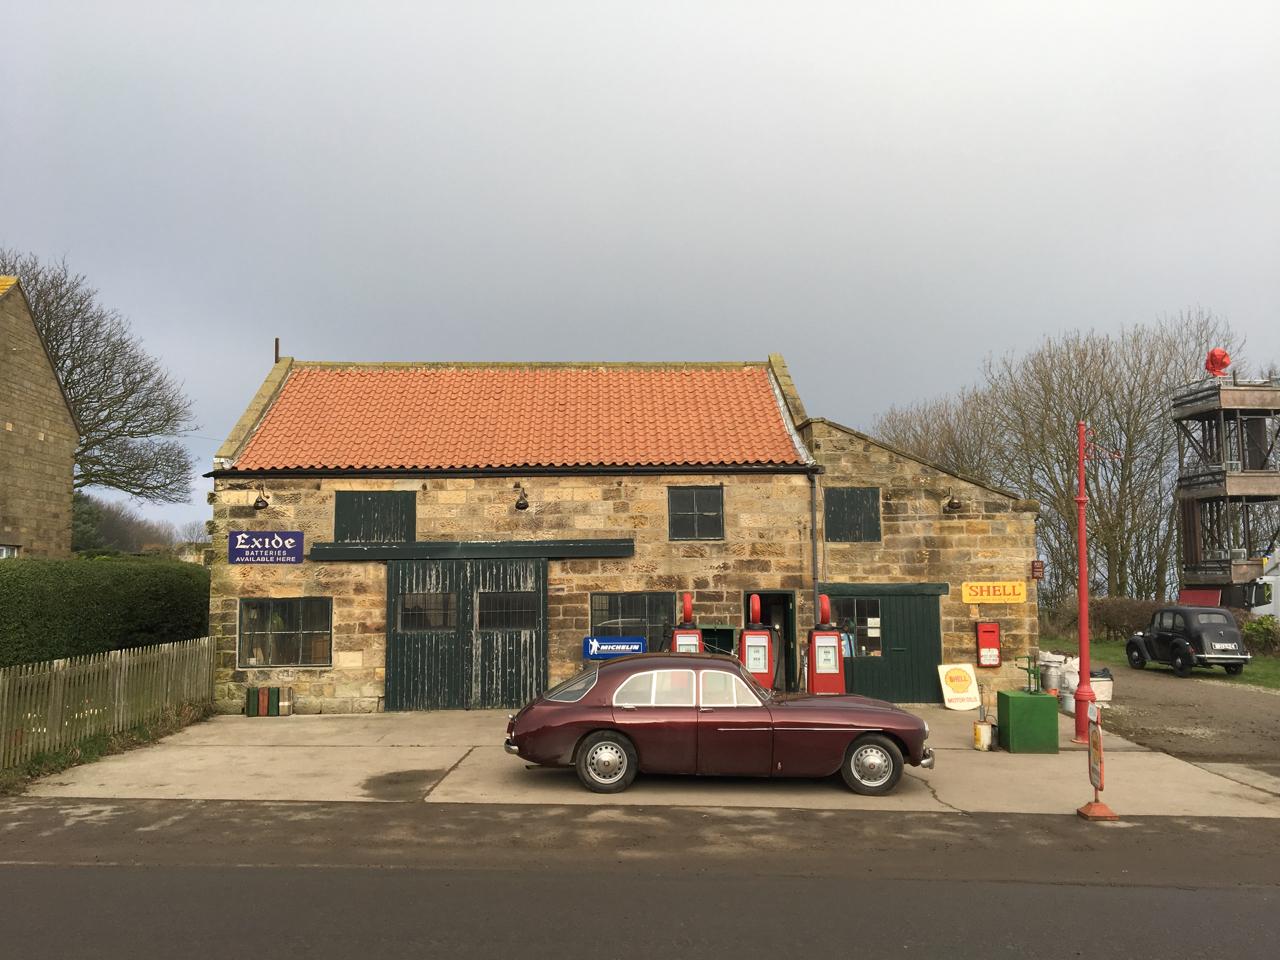 Ext Petrol Station1_Phantom Thread_Adam Squires 2017.jpg